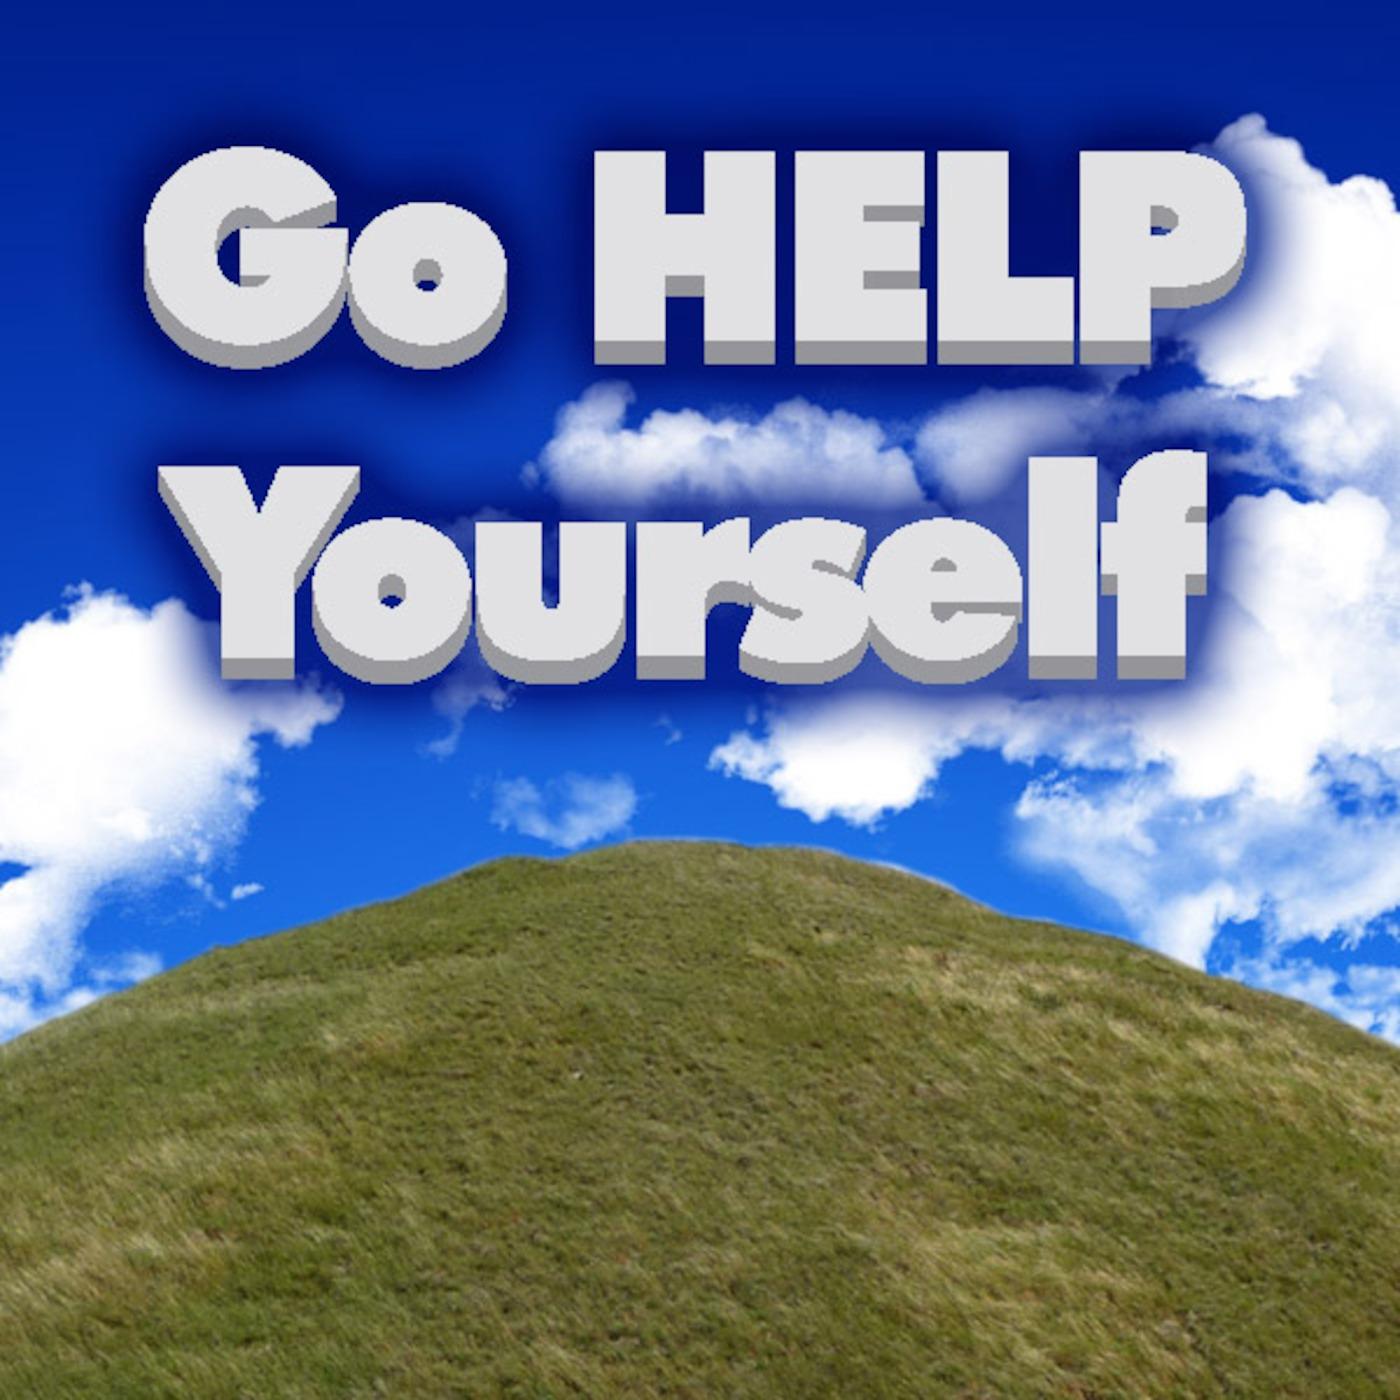 Go HELP Yourself